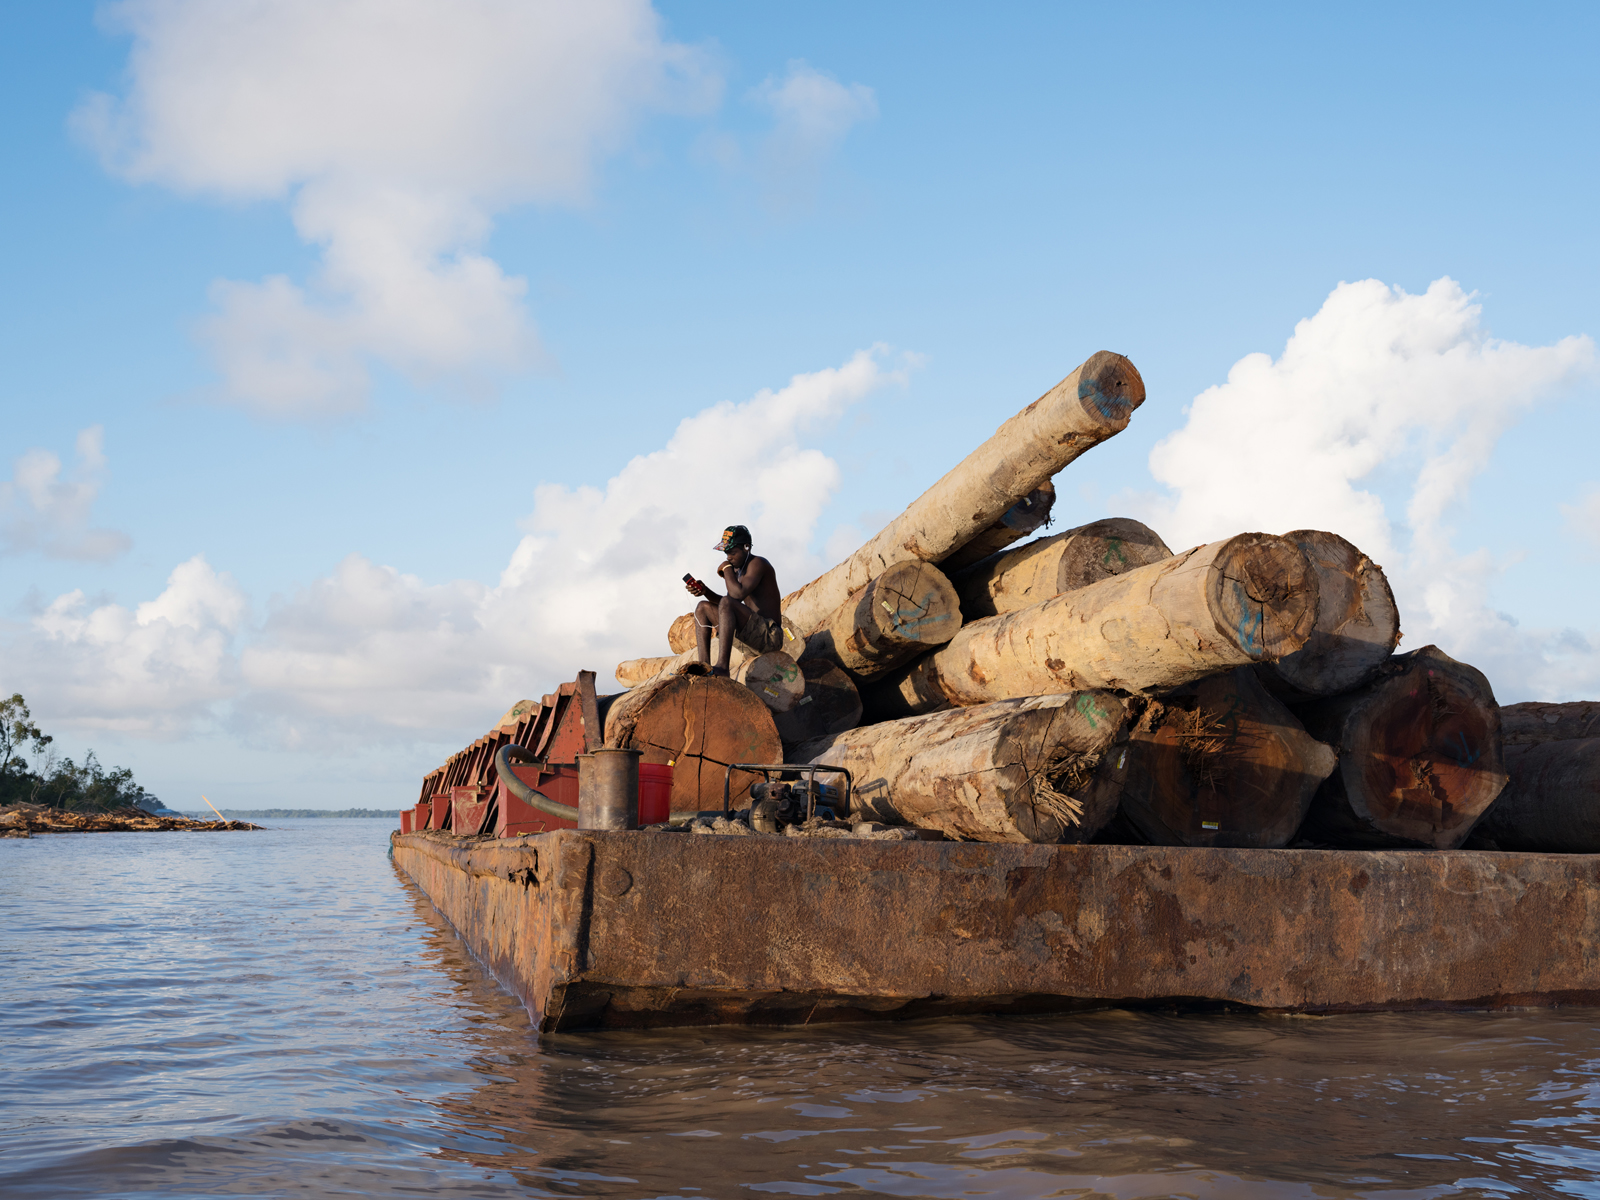 Kurt guarding logs for export to China, Essequibo River, Guyana. © Lucas Foglia, courtesy of Michael Hoppen Gallery, London.